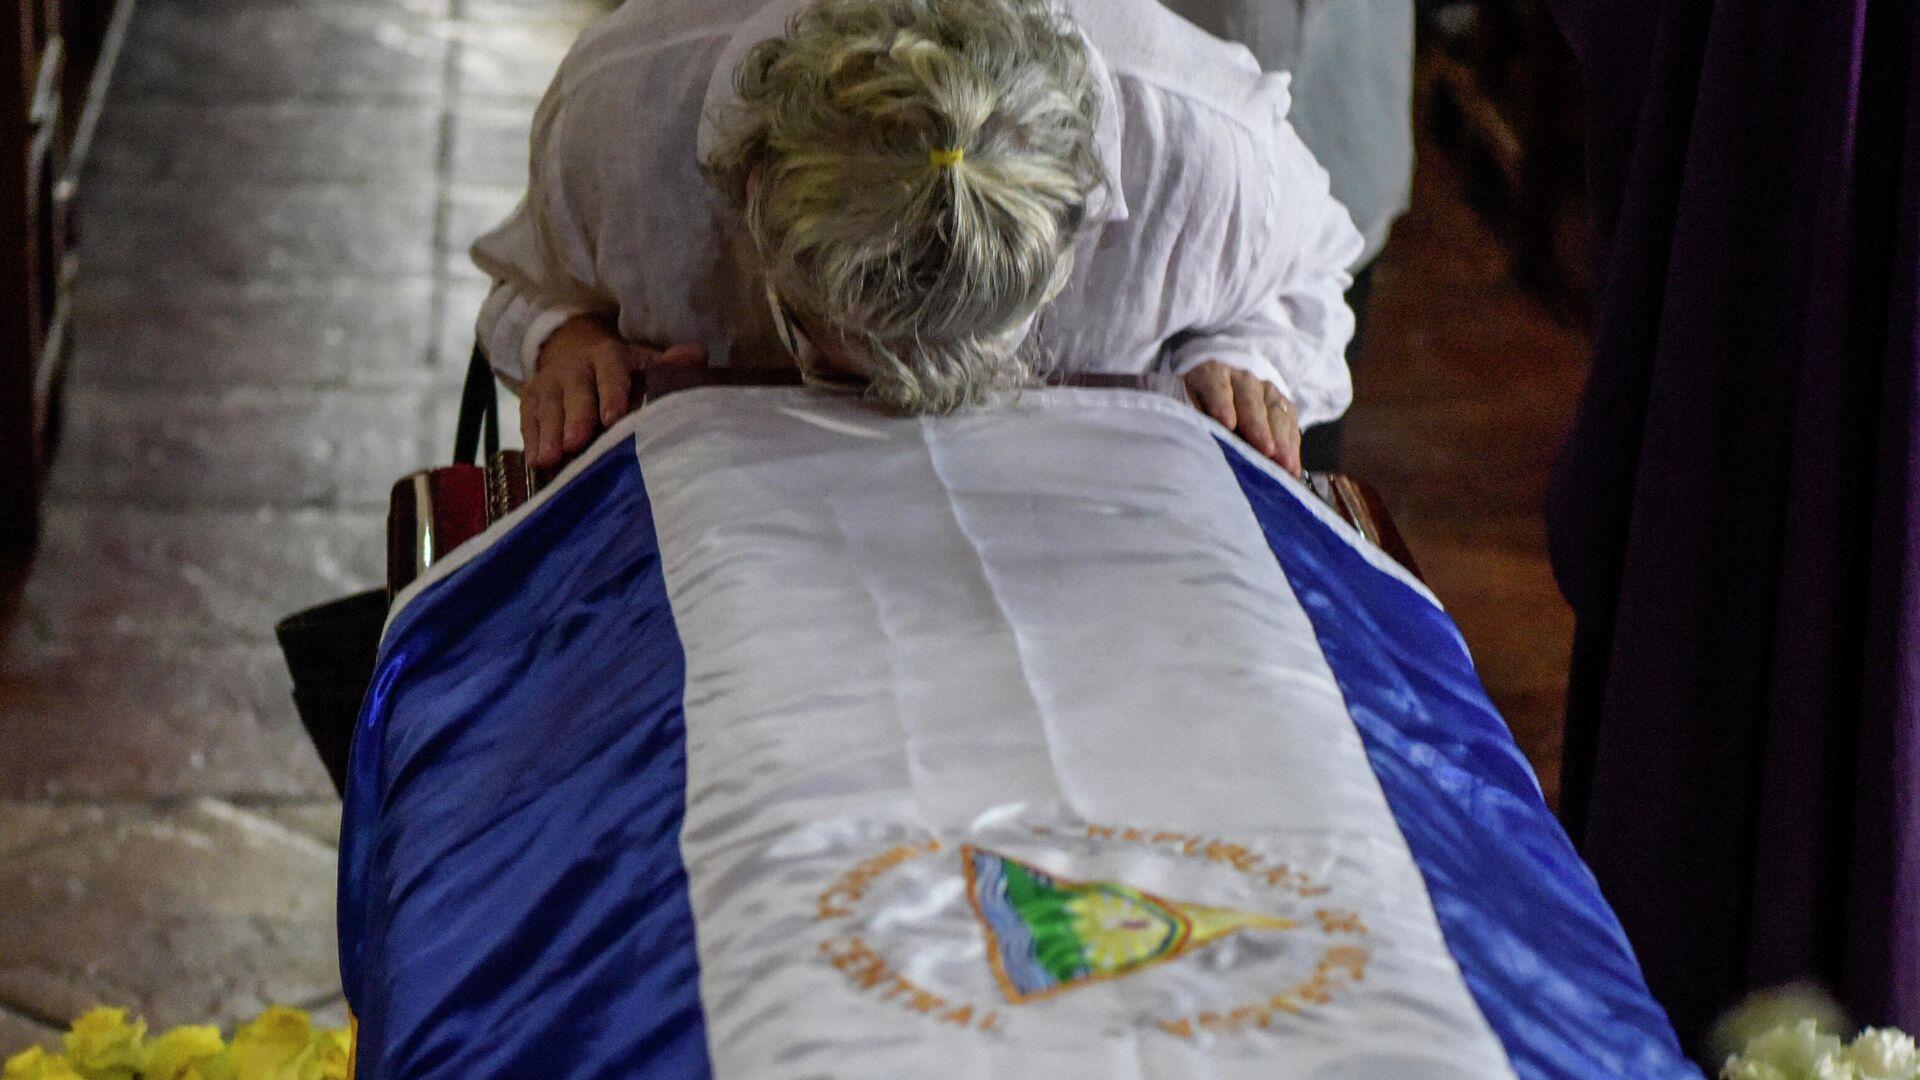 Velatorio del expresidente de Nicaragua Enrique Bolaños - Sputnik Mundo, 1920, 15.06.2021